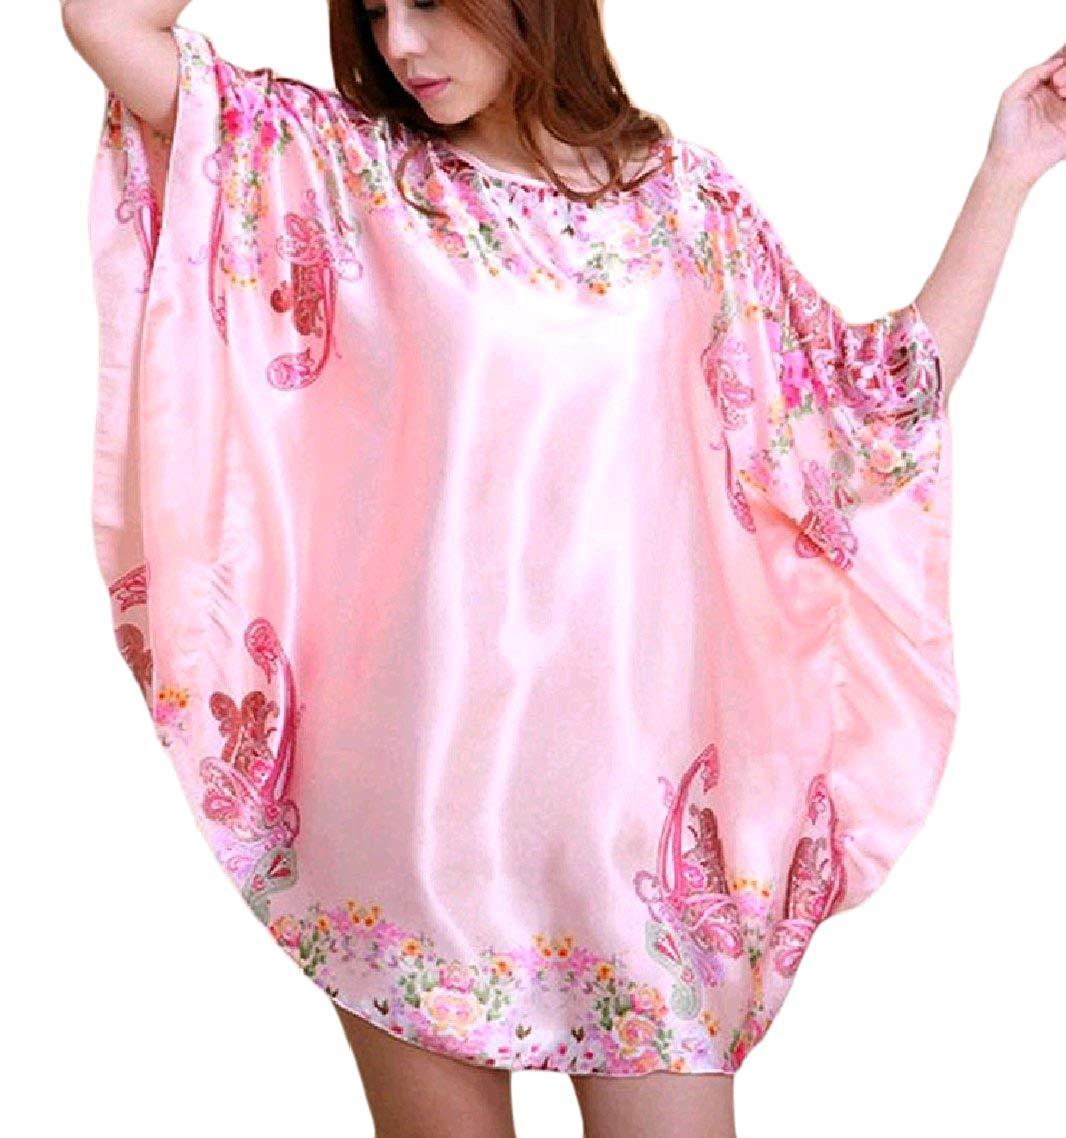 111105a623 Get Quotations · Zago Womens Irregular Floral Print Silk Comfy Nightwear  Dress PJS Pajama